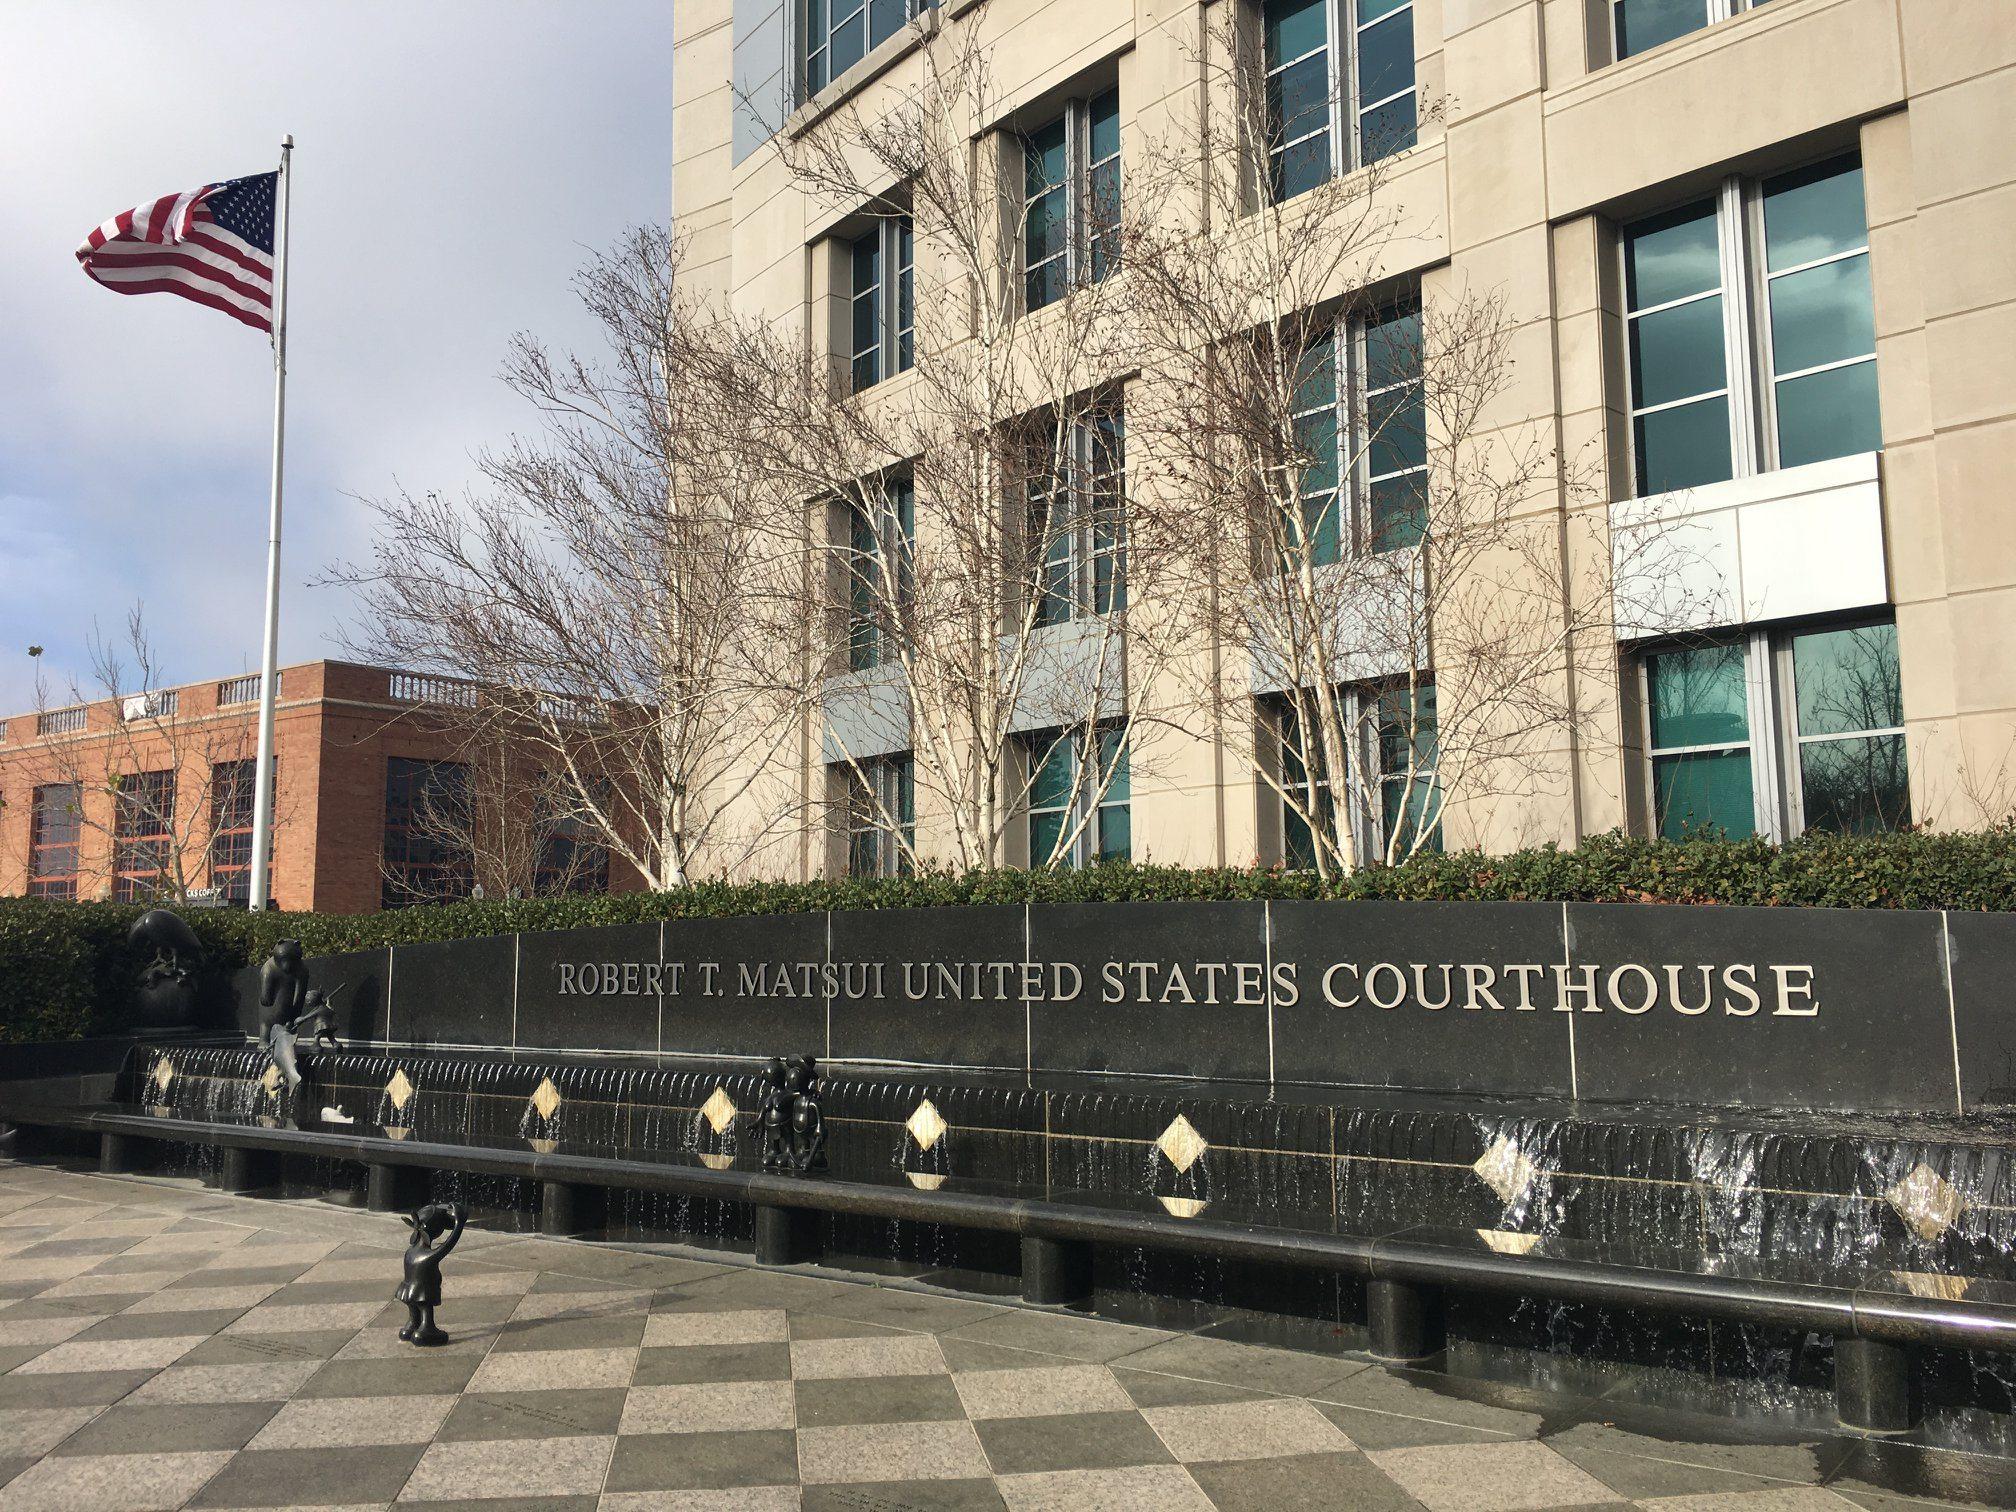 GSA Robert Matsui courthouse